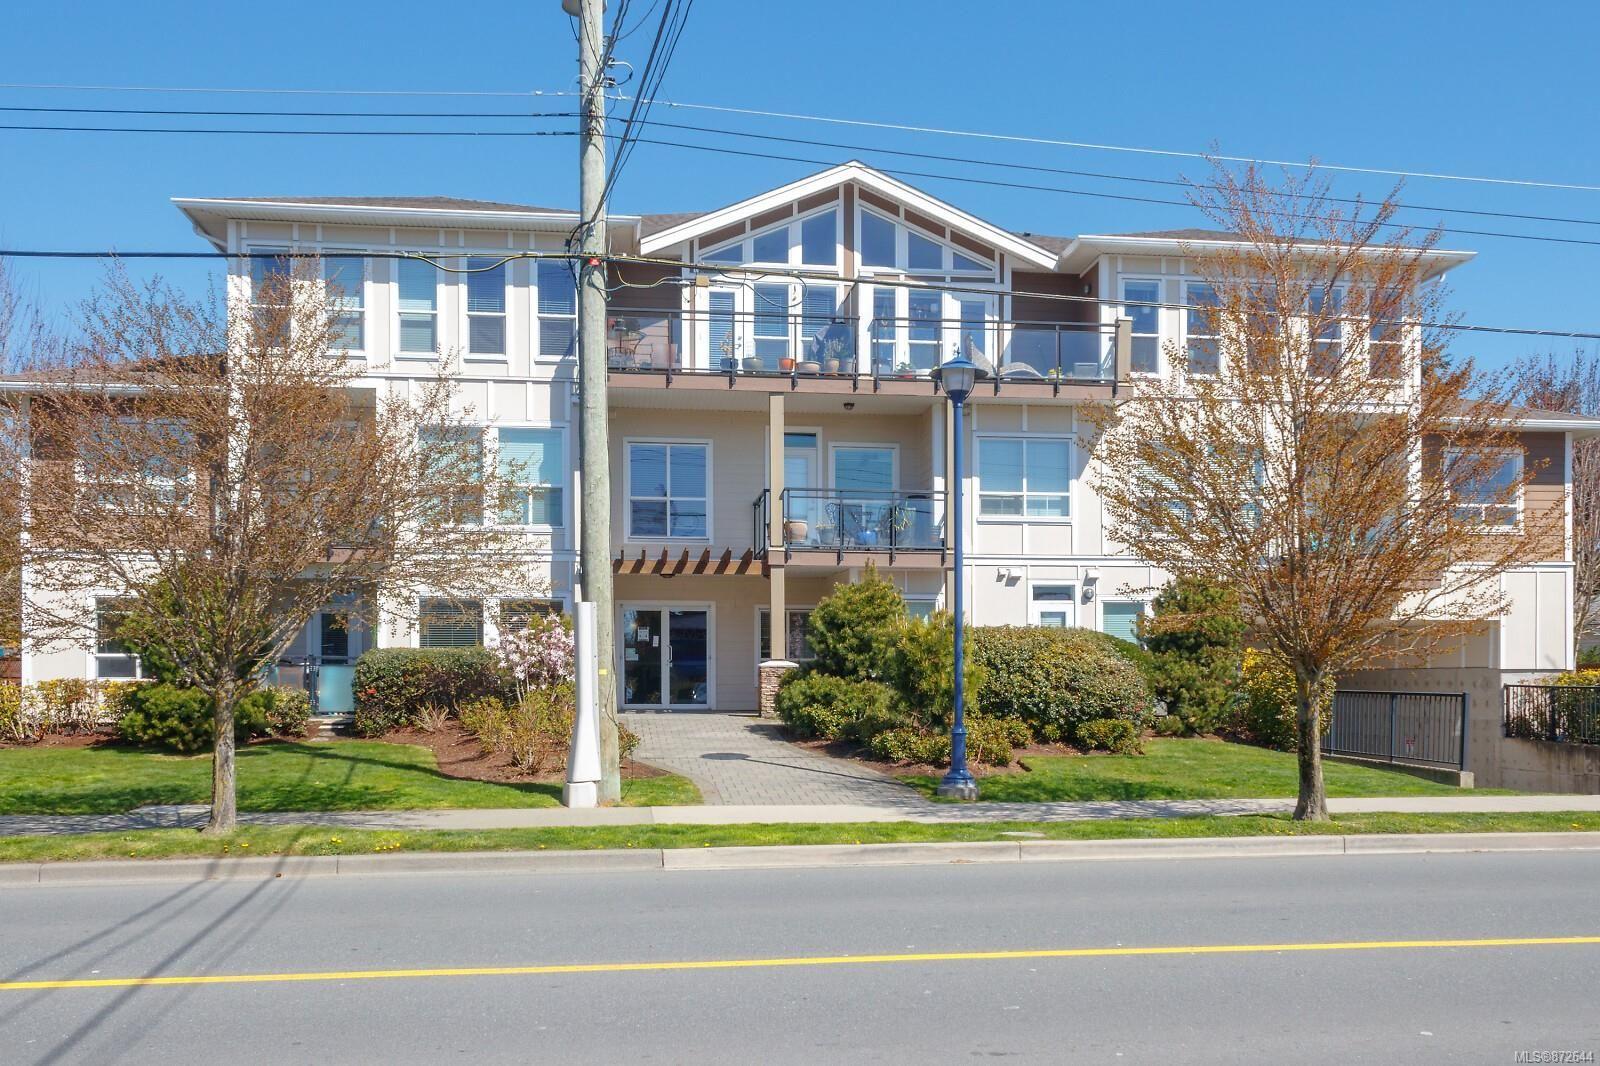 Main Photo: 211 938 Dunford Ave in : La Langford Proper Condo for sale (Langford)  : MLS®# 872644